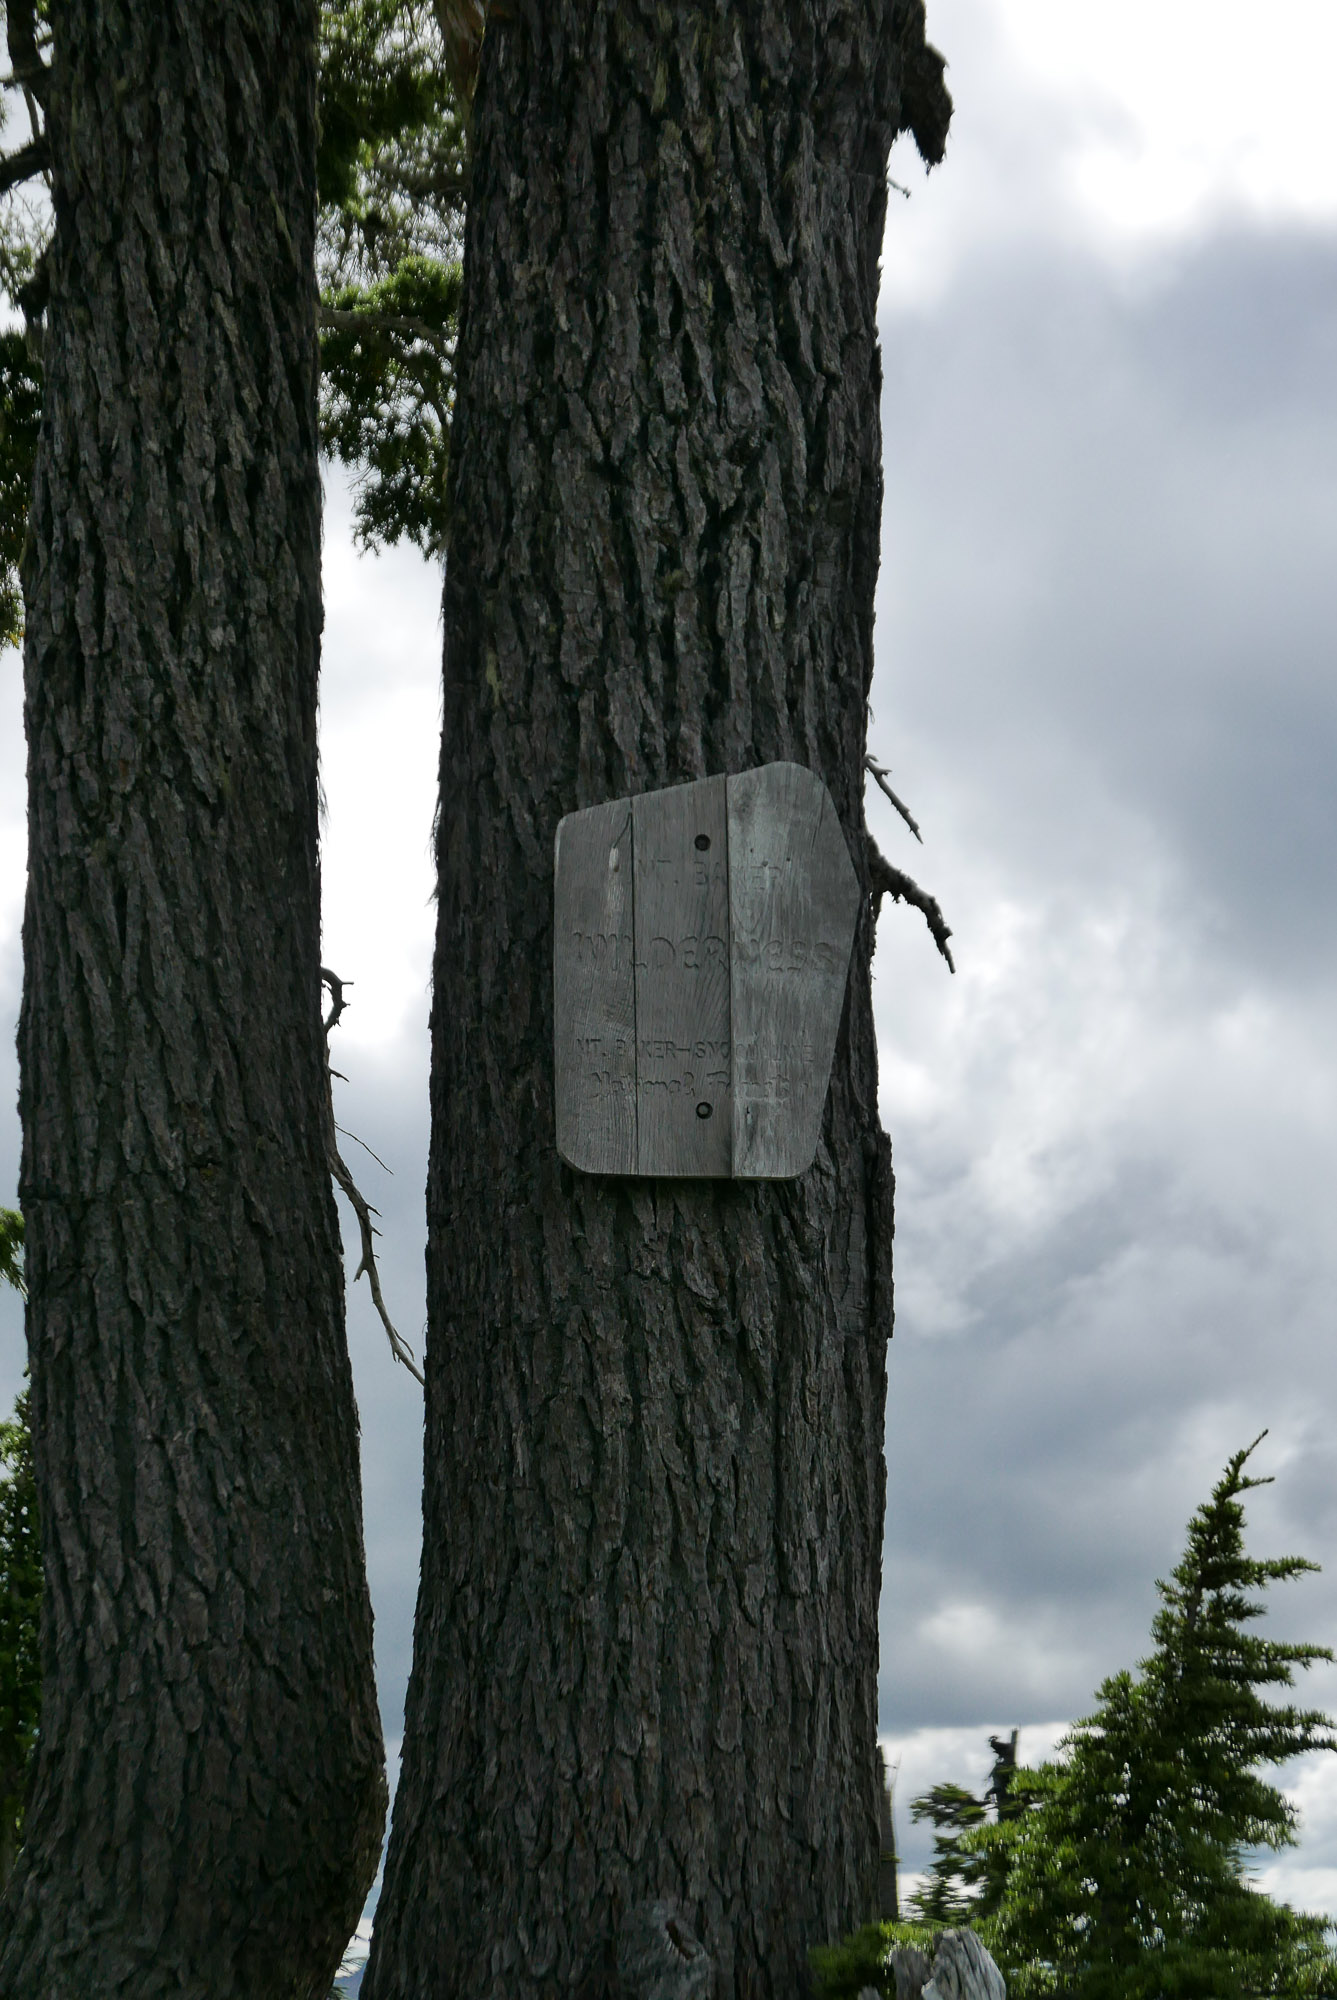 boundary sign